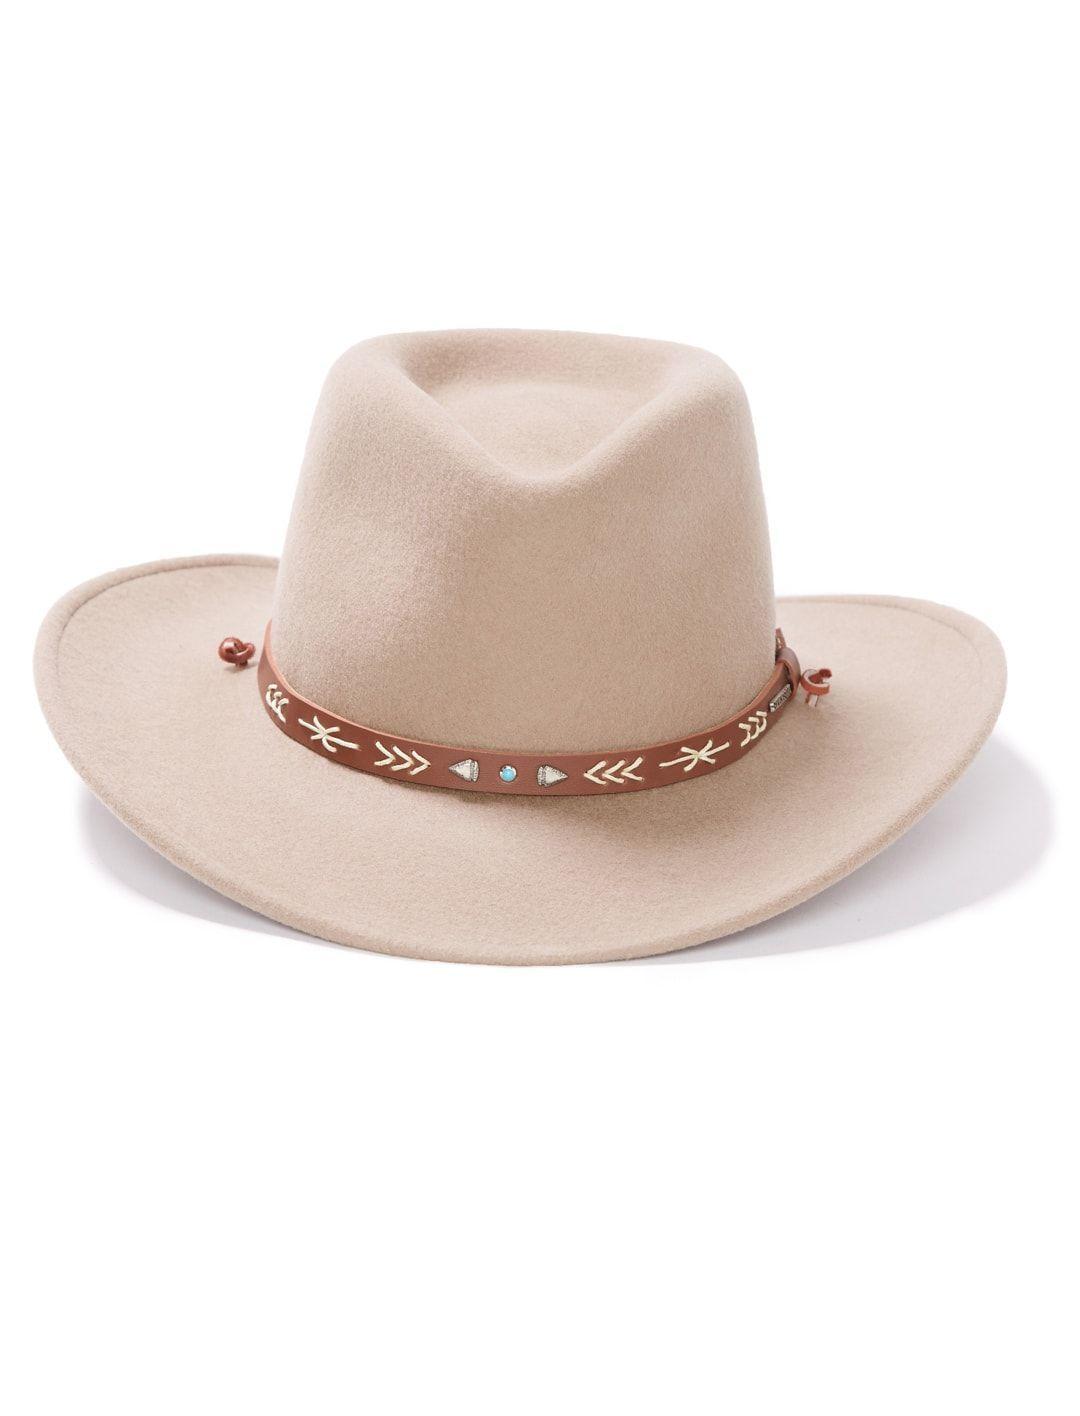 Stetson Men s Santa Fe Outdoor Hat TWSTFE8130 b3305fc014b